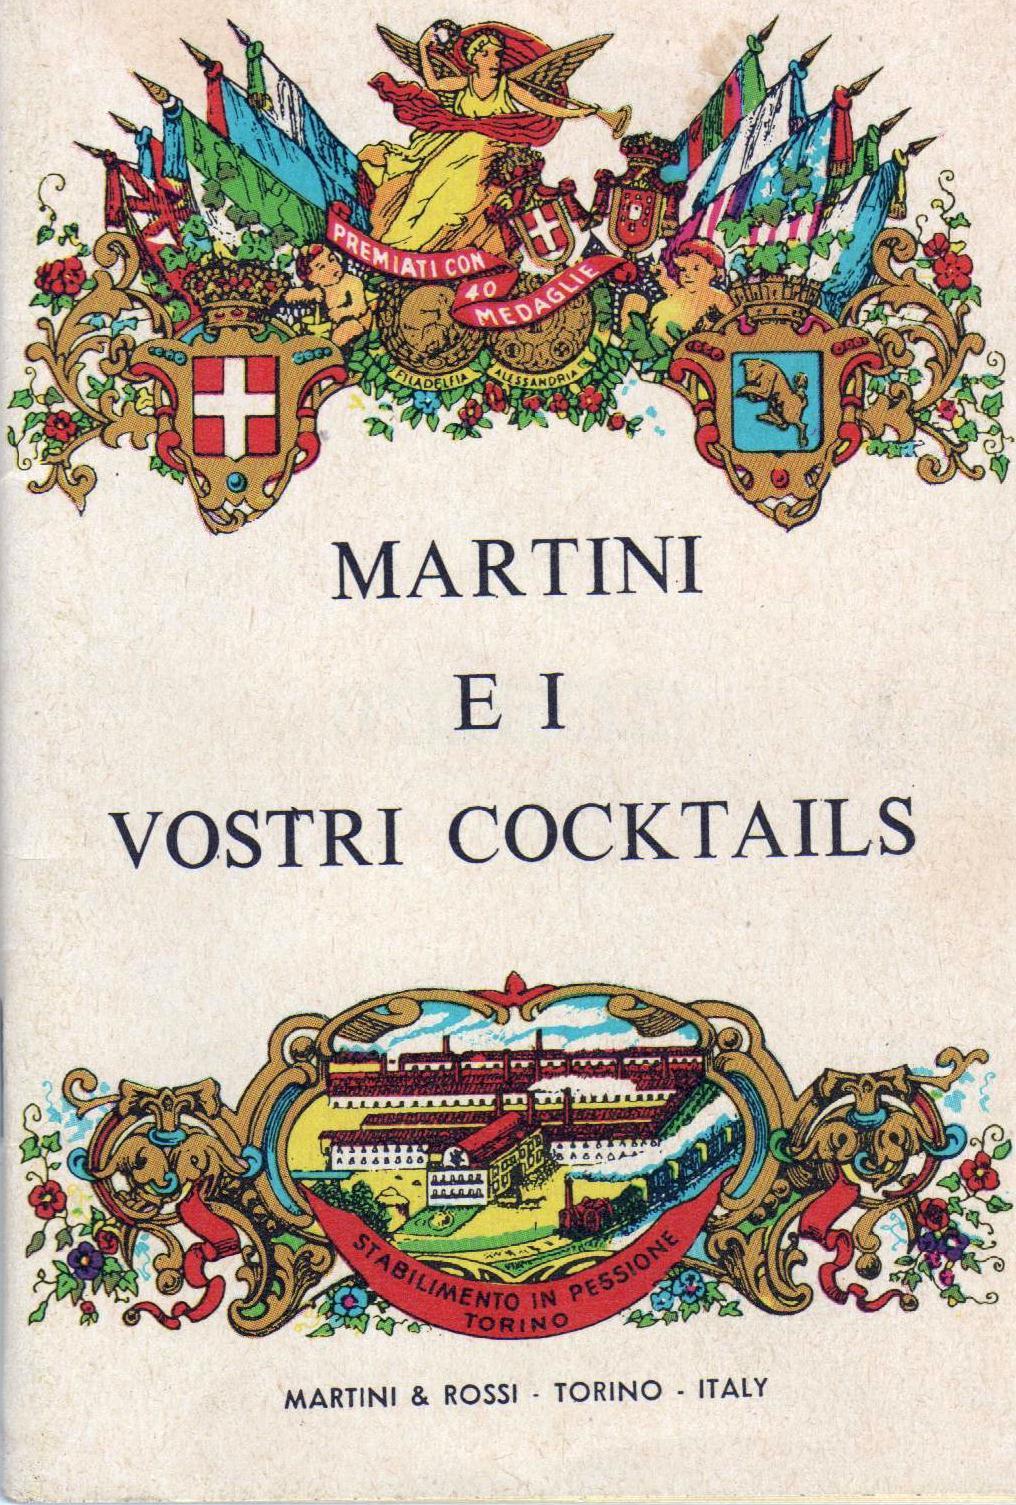 Martini e i vostri cocktails